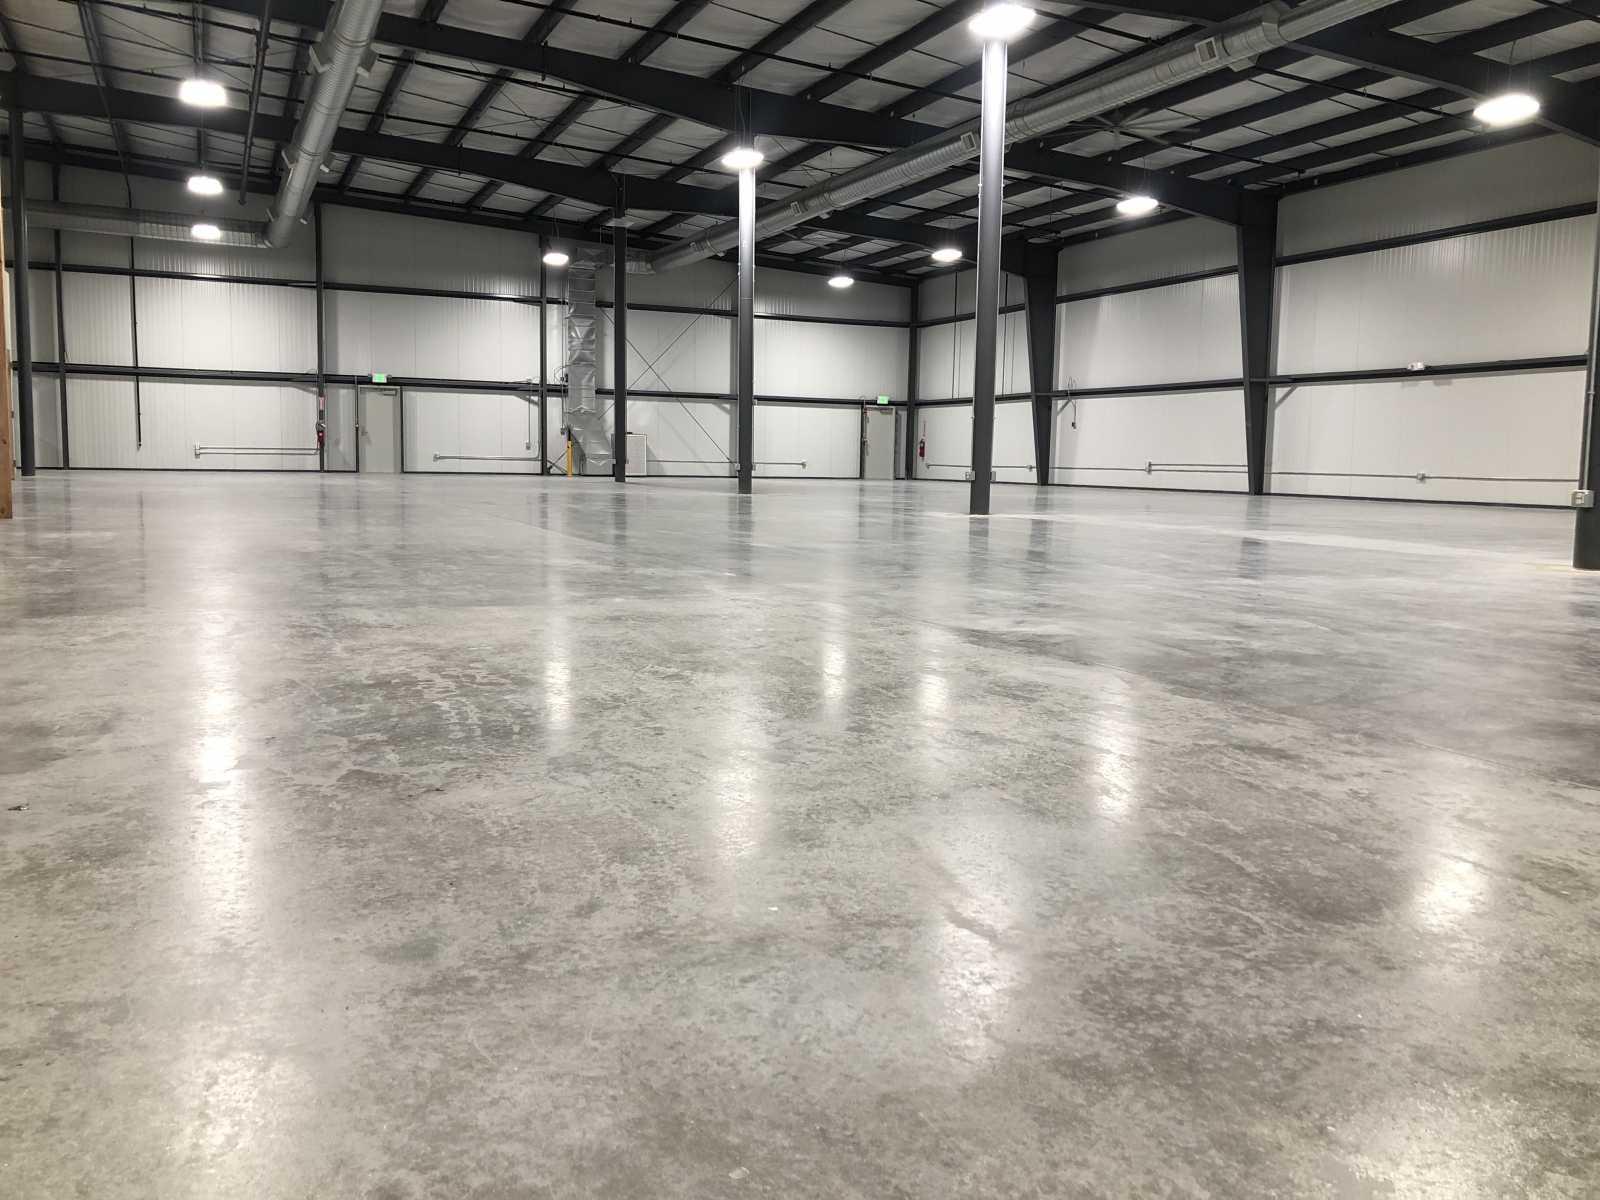 Best Sealer For An Warehouse